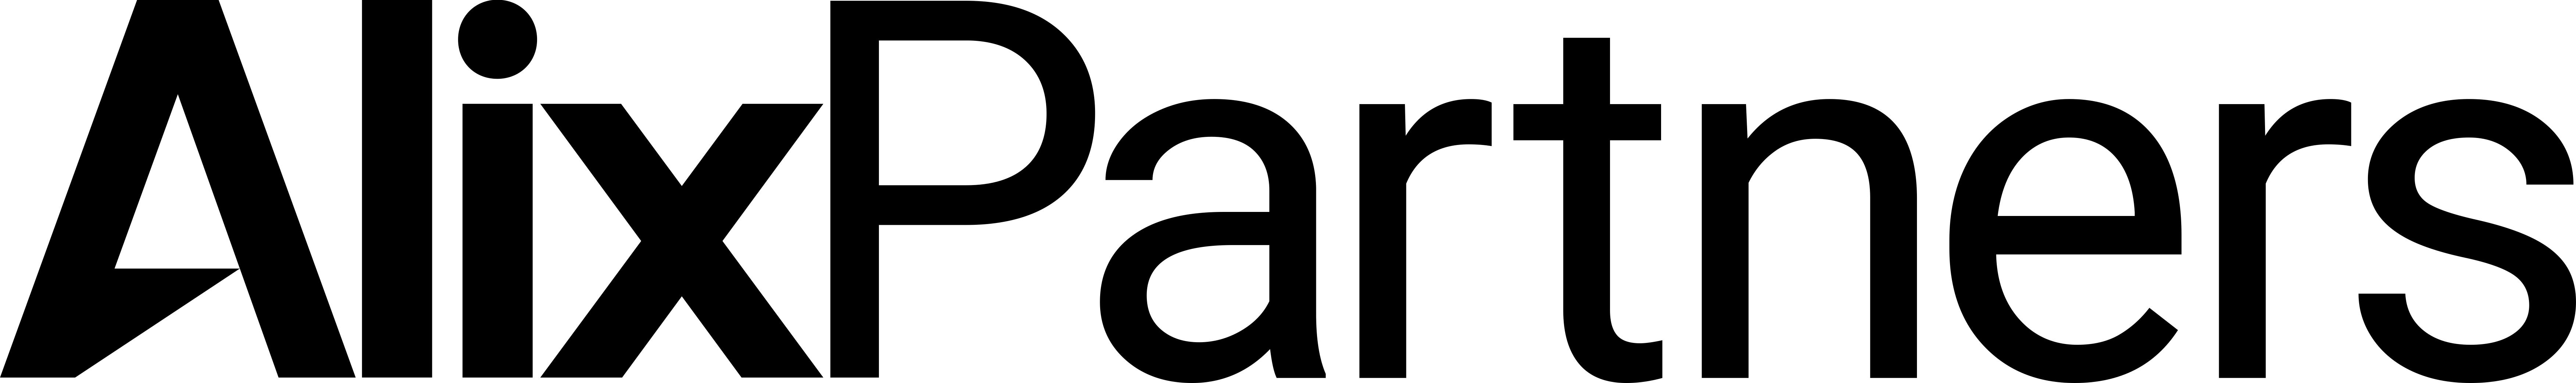 Alix Partners